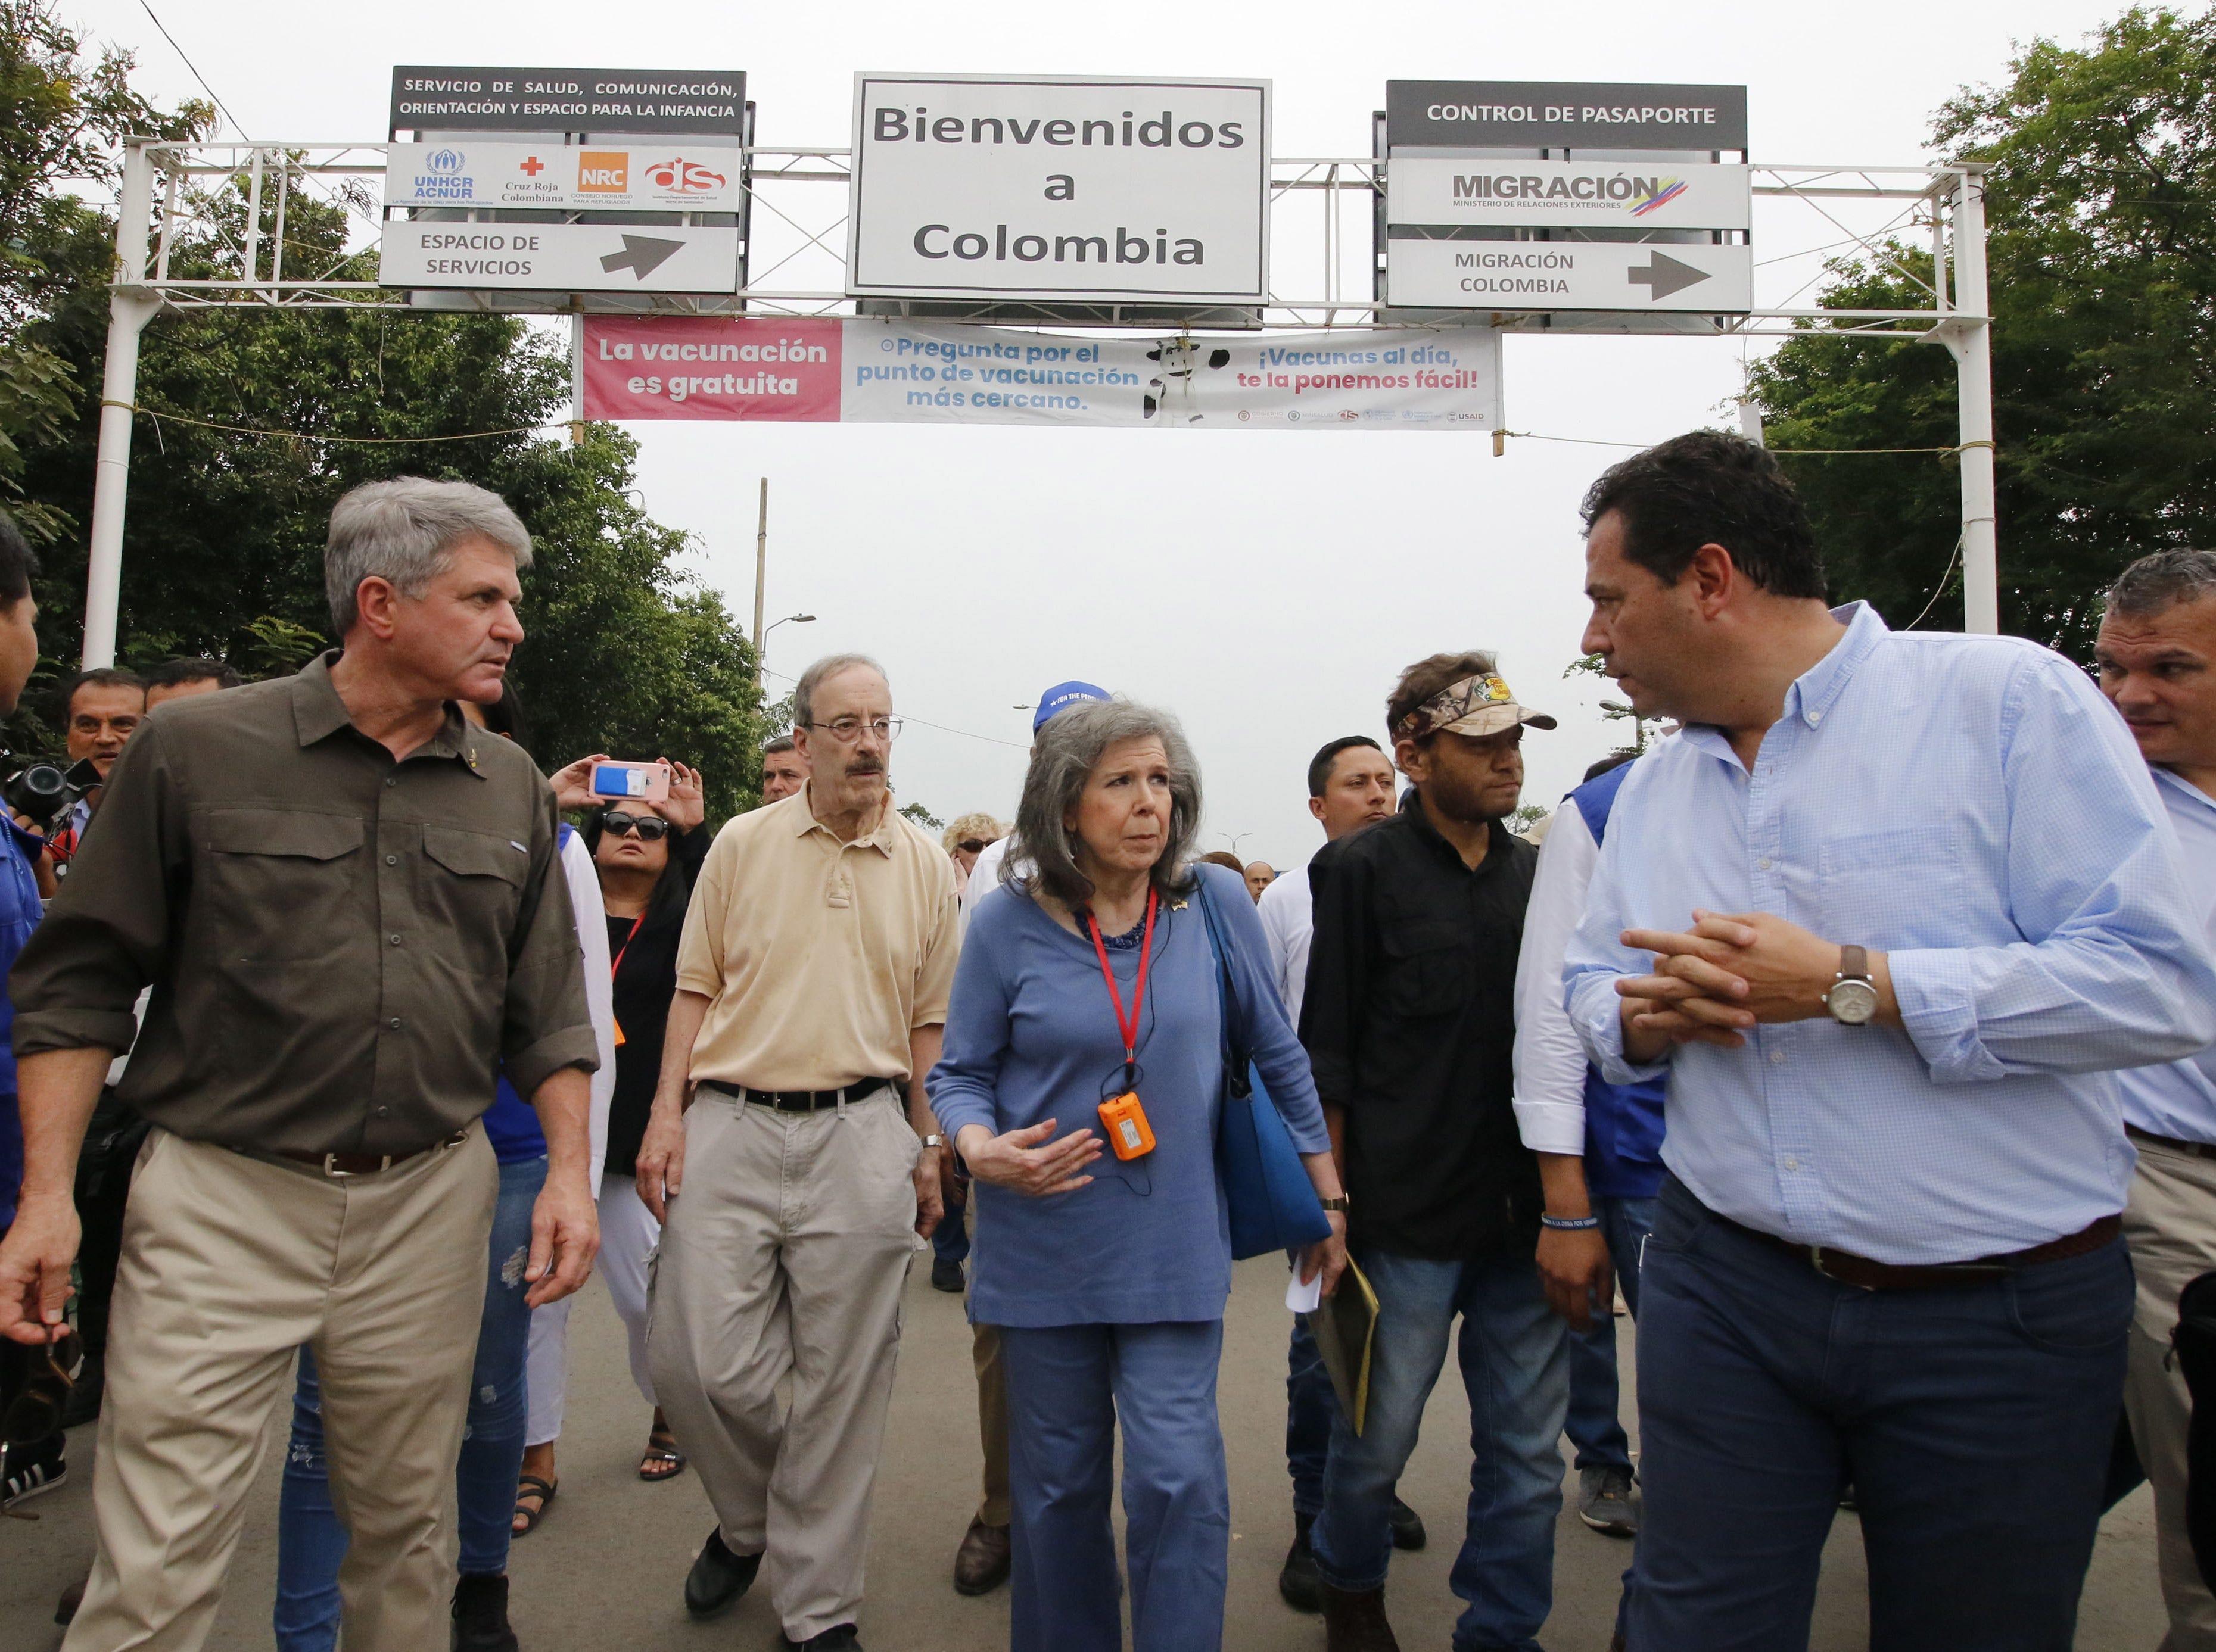 US Senators Michael McCaul, left and Eliot Engel, 2nd left, participate in a visit of several US senators to the Simon Bolivar international bridge, on the border between Venezuela and Cucuta, Colombia on March 29, 2019.